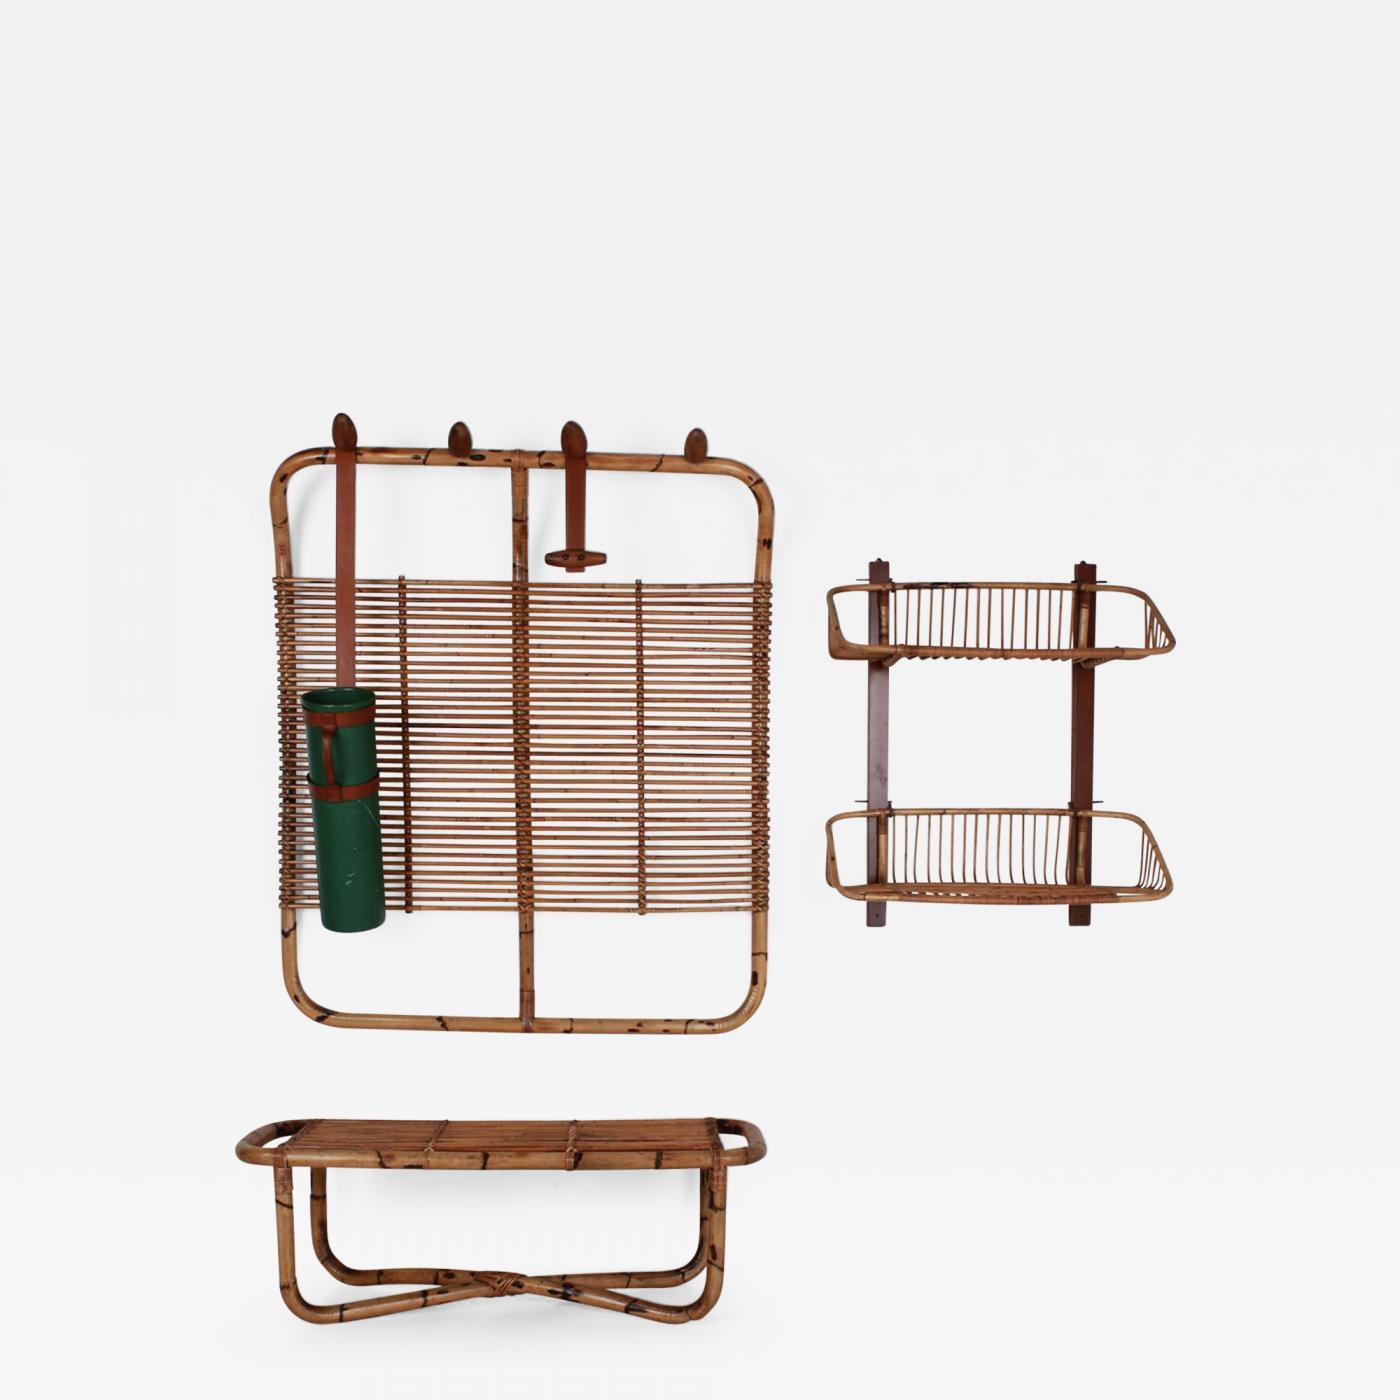 vittorio bonacina bamboo coat rack bench and shelf. Black Bedroom Furniture Sets. Home Design Ideas